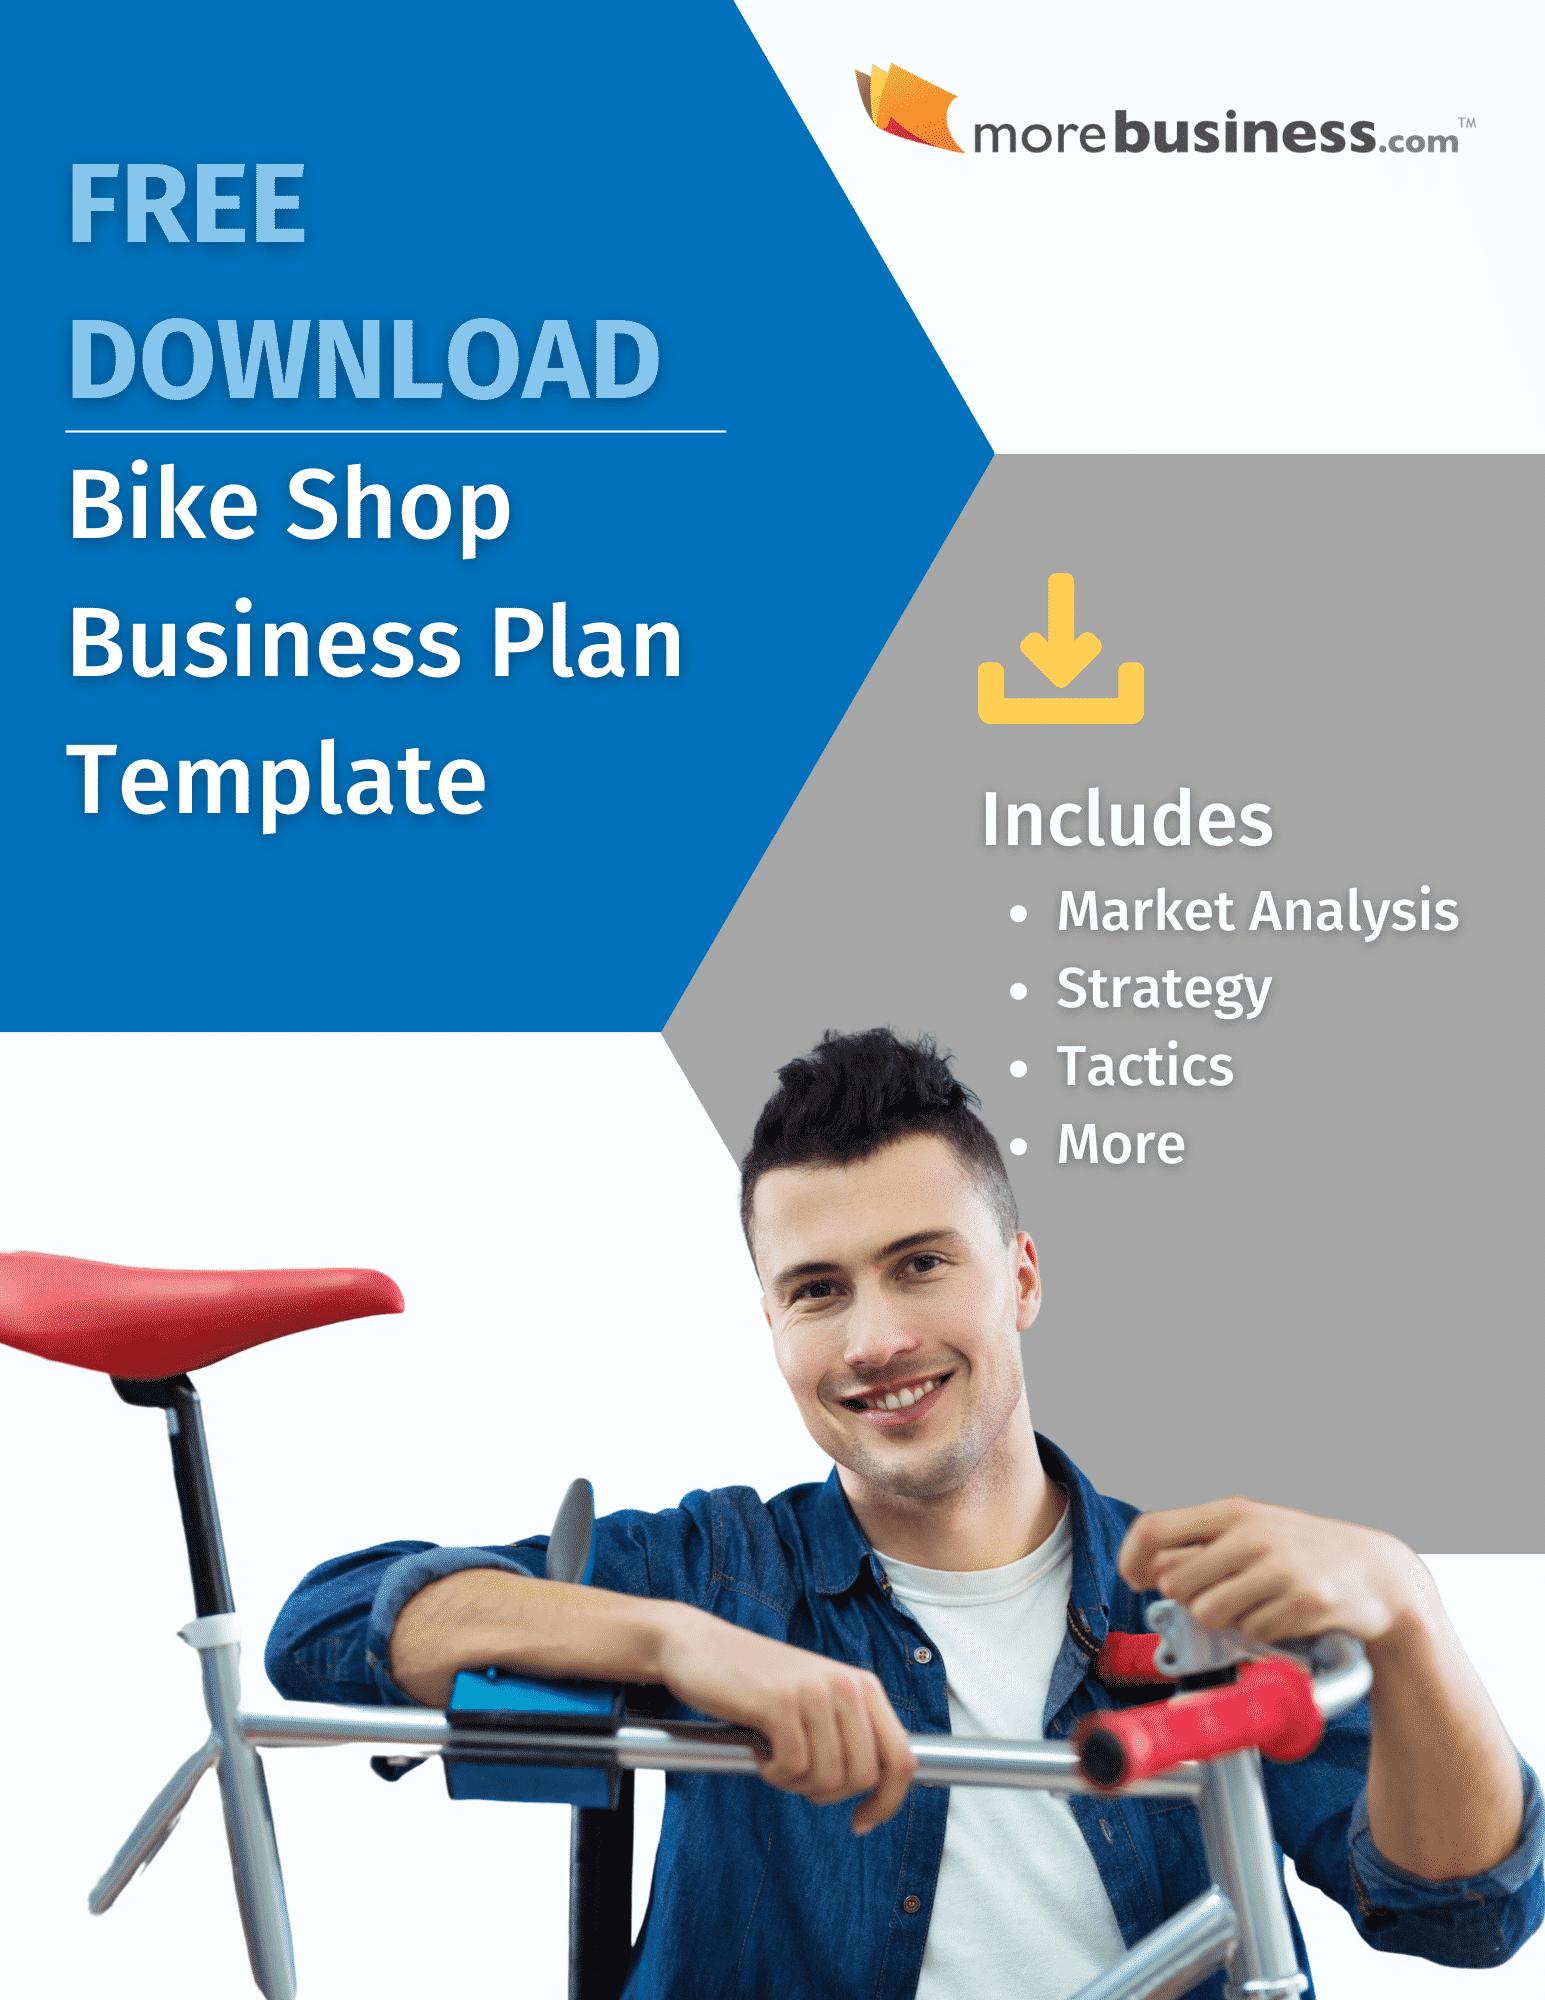 bike shop business plan - free download